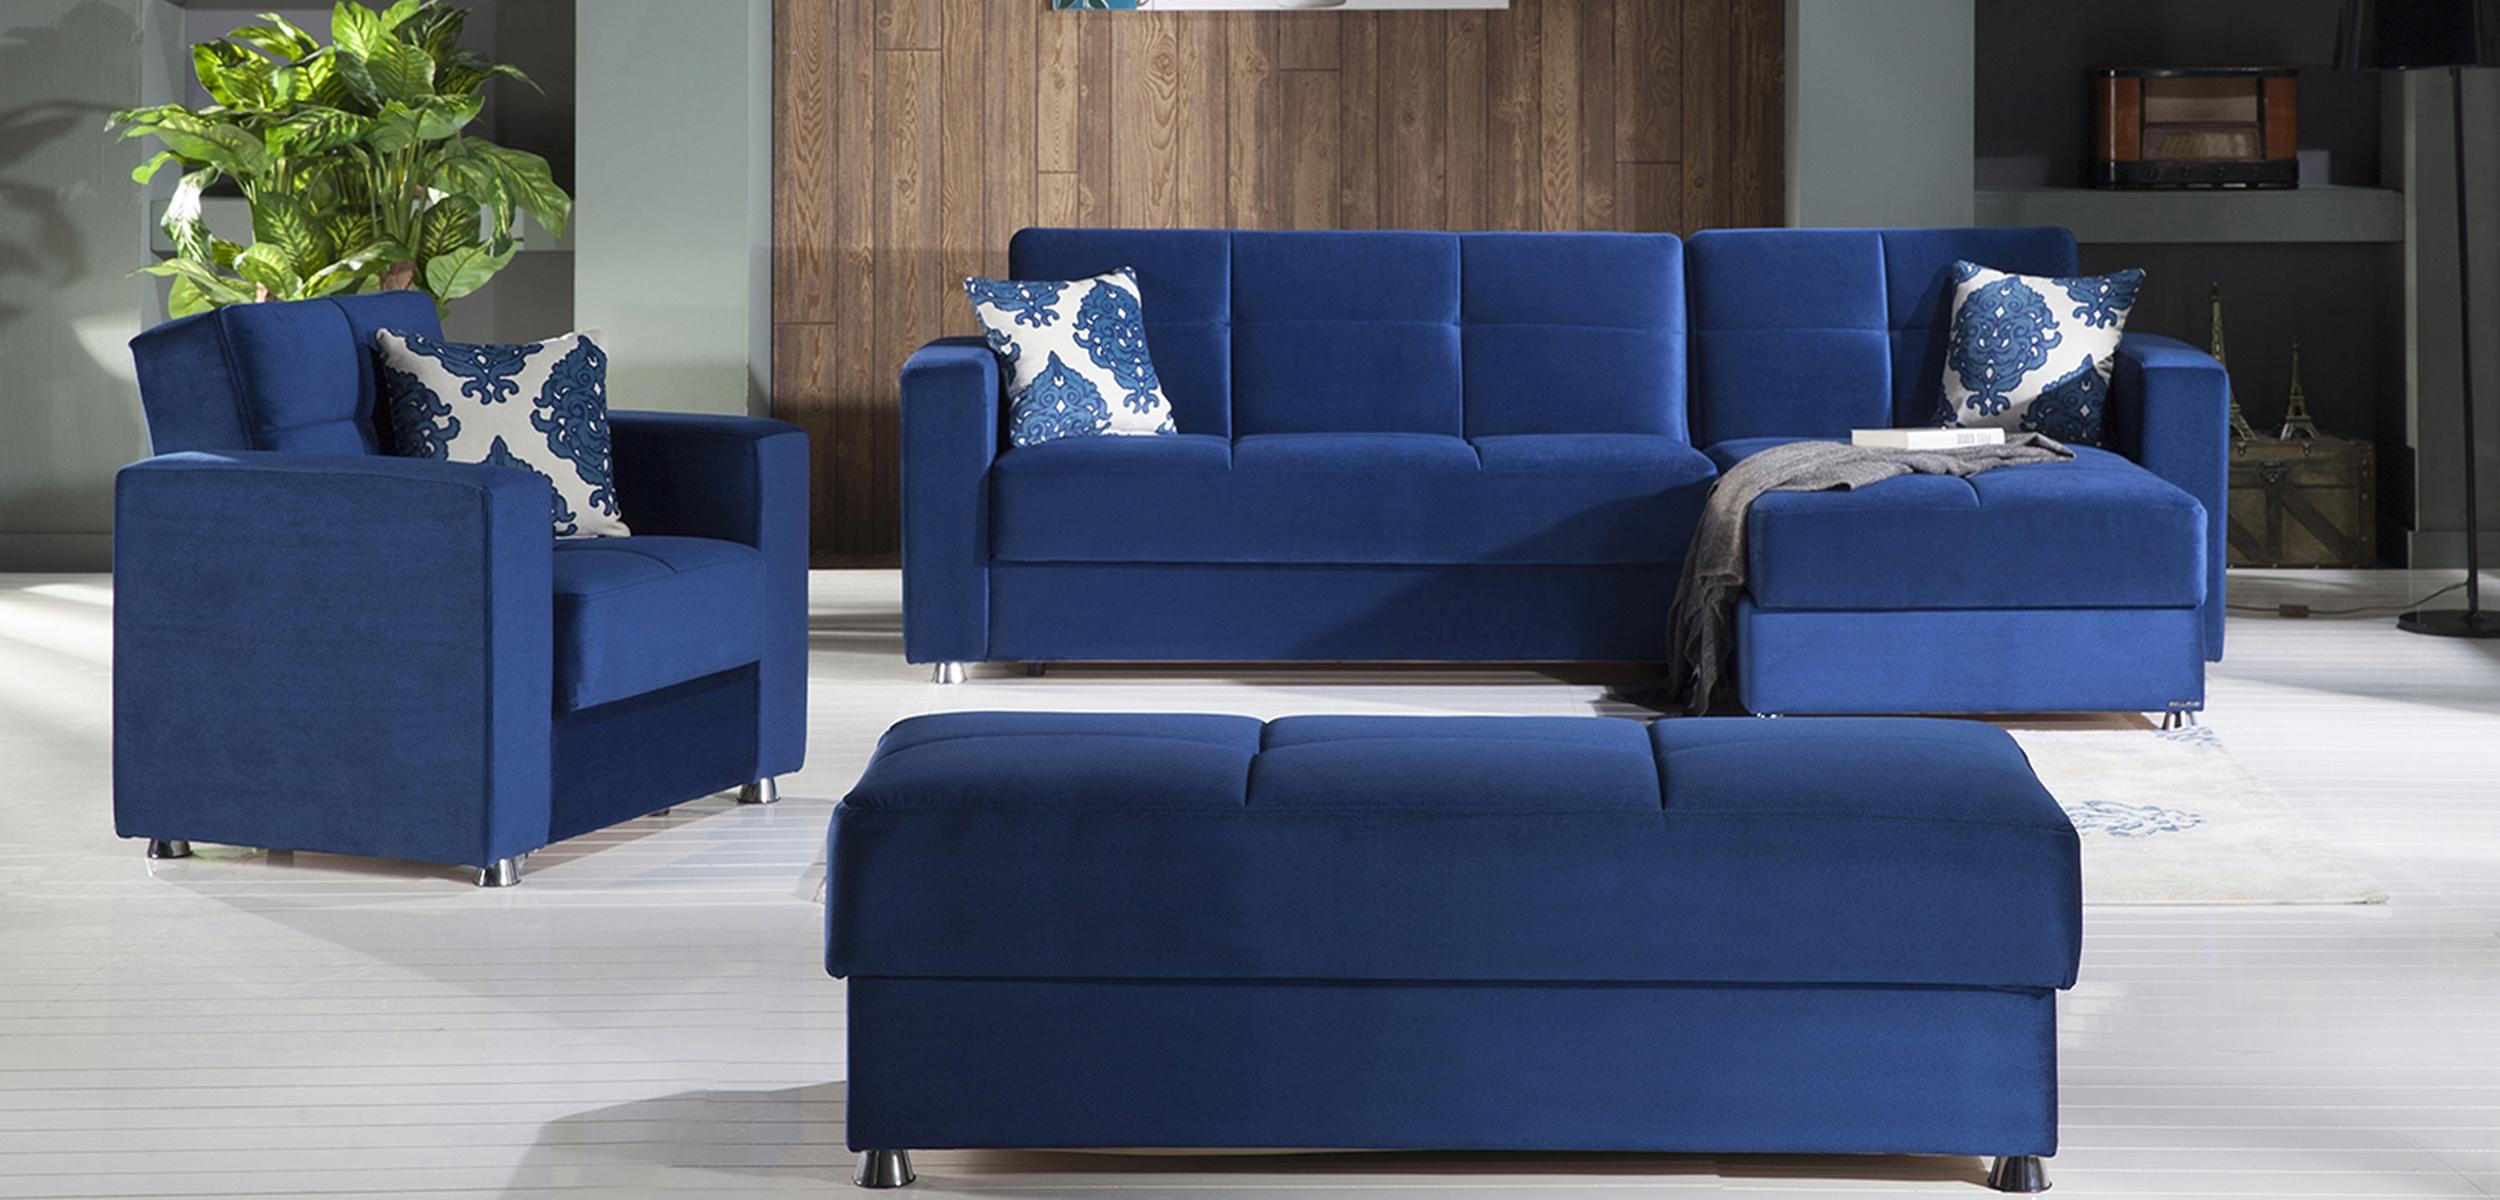 American comfort furniture mattress discount at 3935 for Furniture 60618